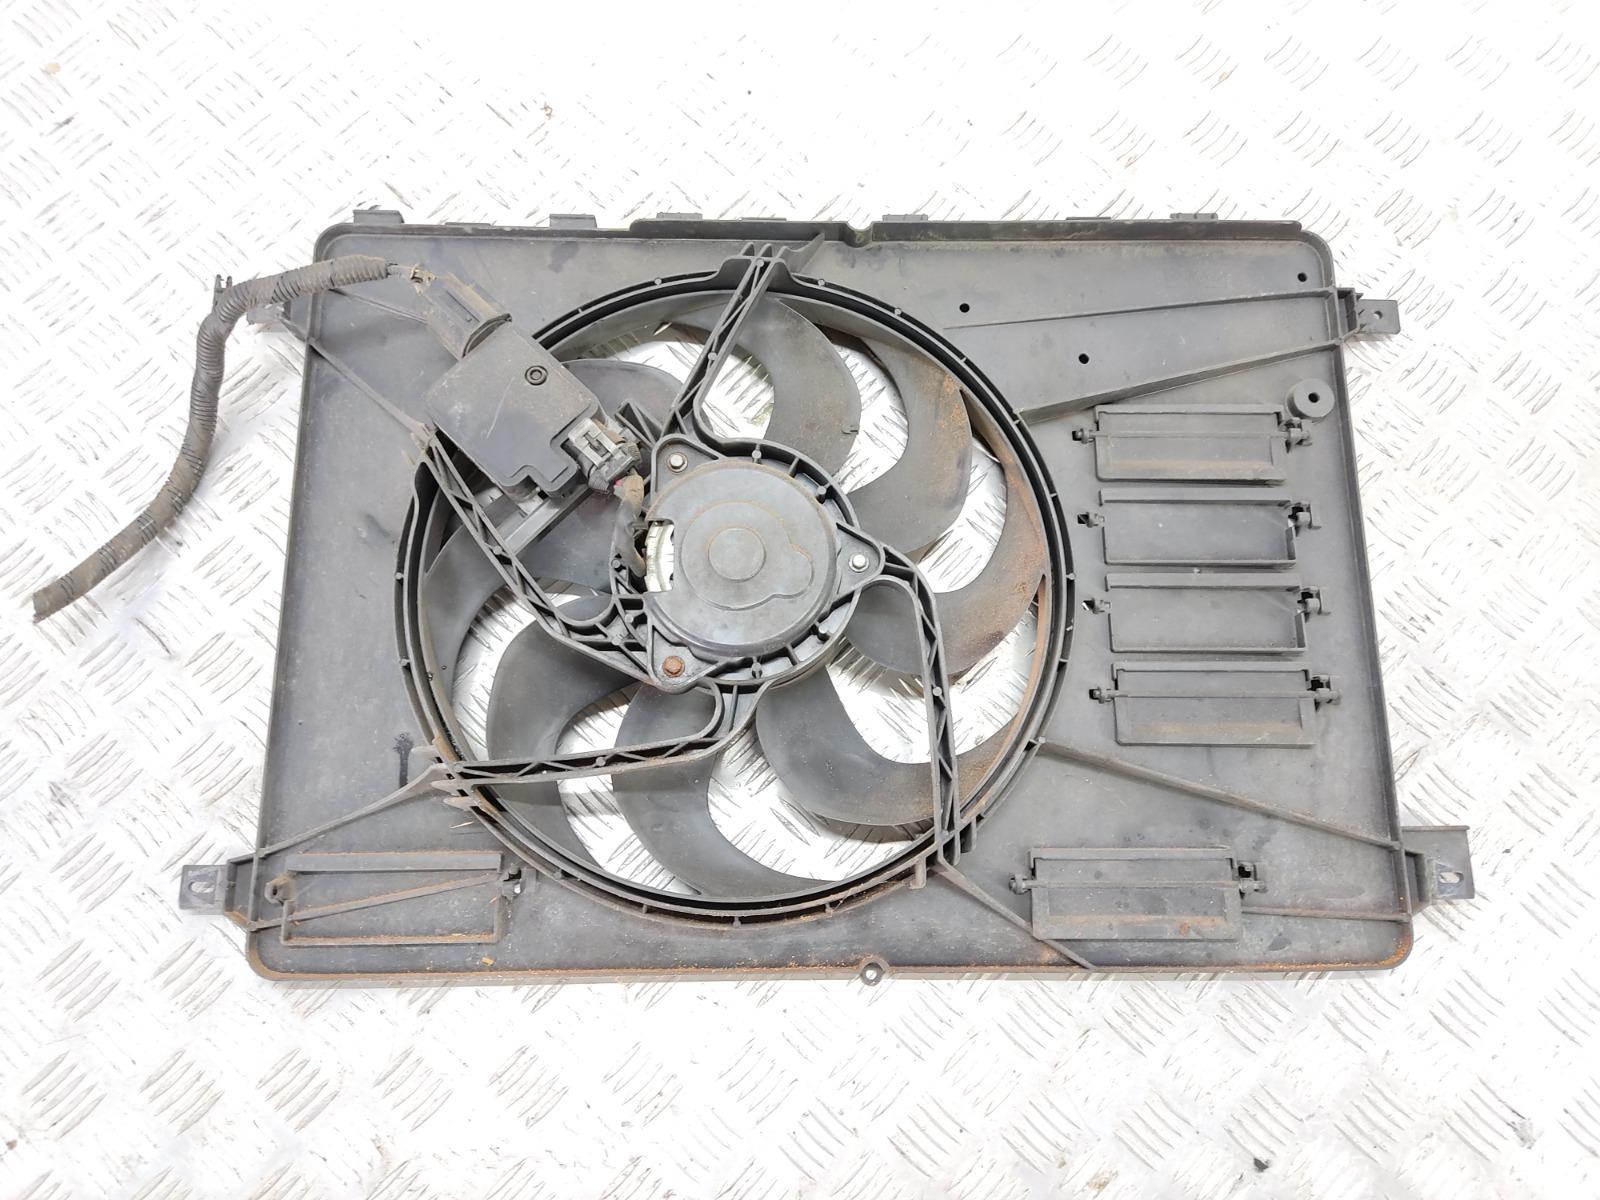 Вентилятор радиатора Ford Mondeo 2.0 TDCI 2008 (б/у)